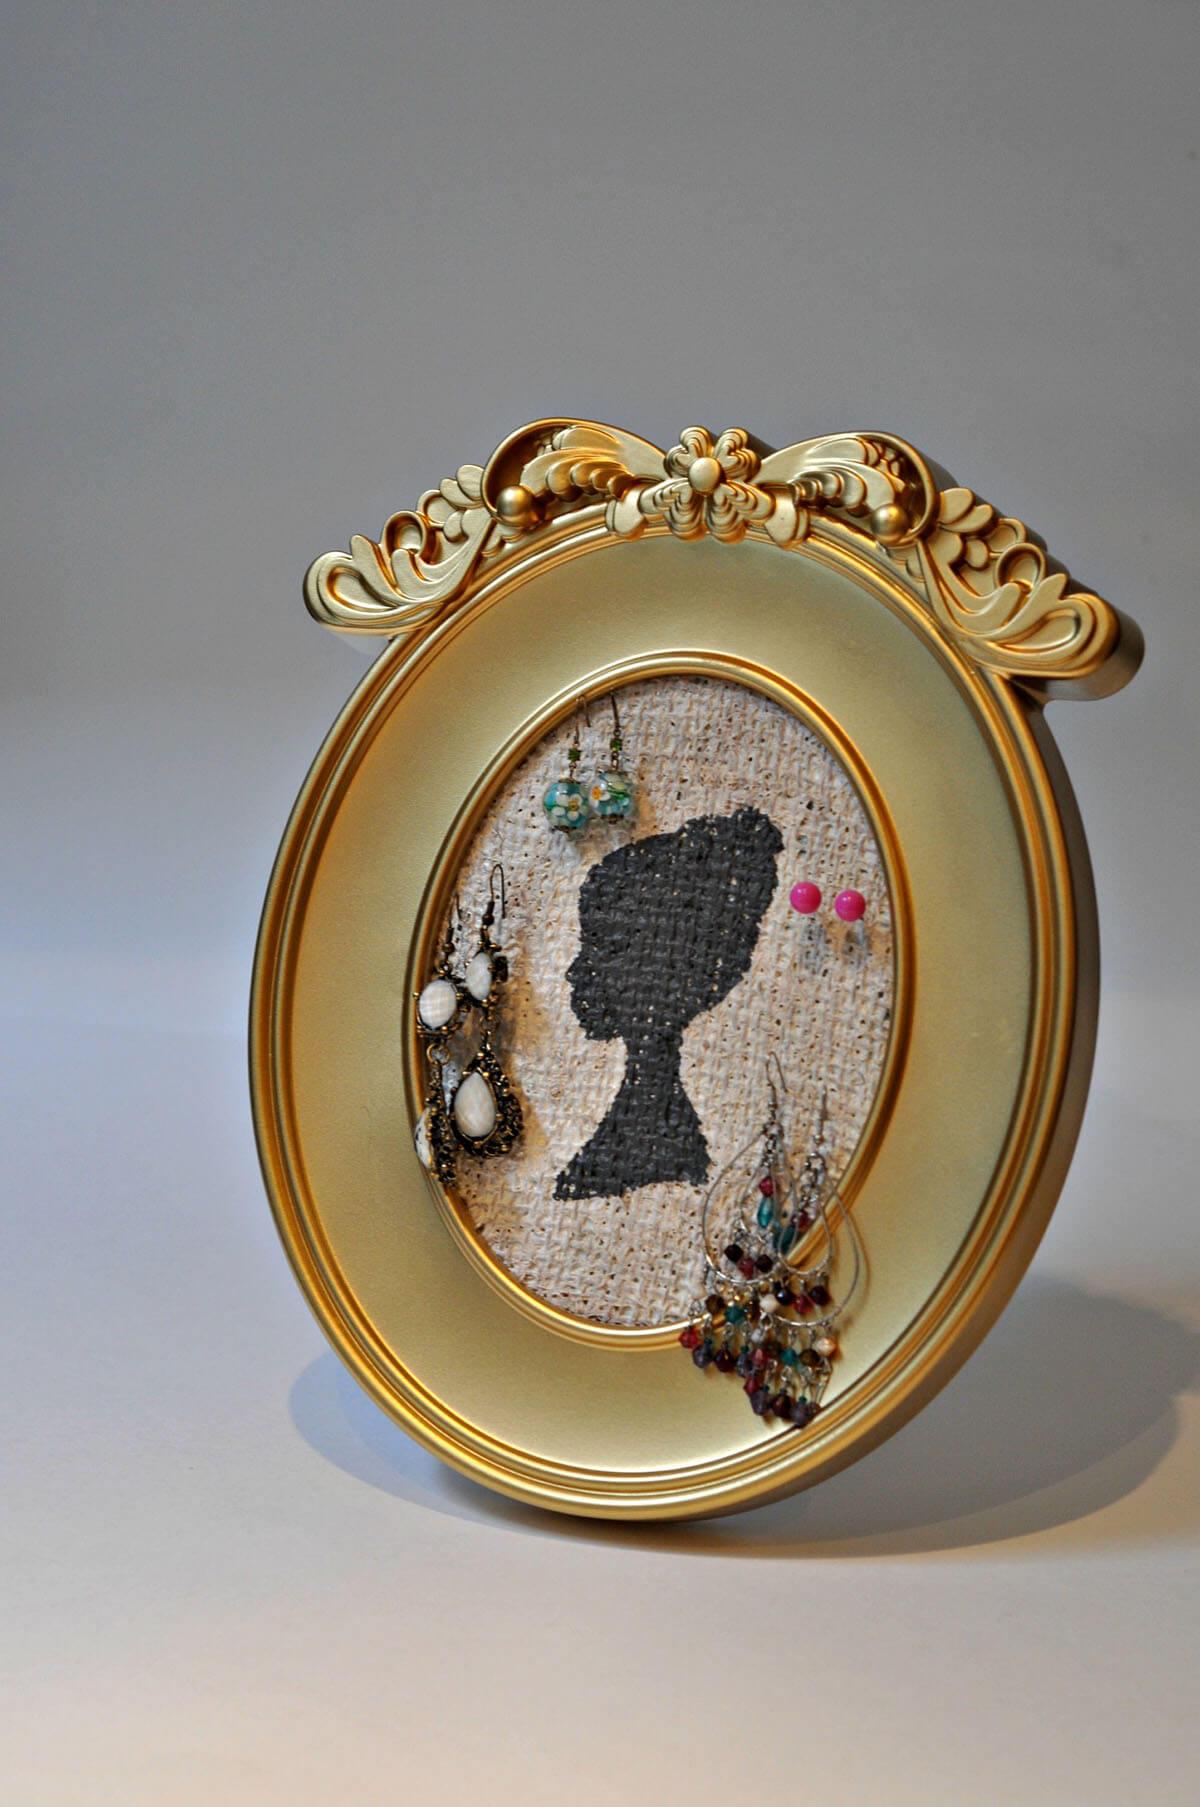 Stunning Gold-Framed Jewelry Organizer Art Piece